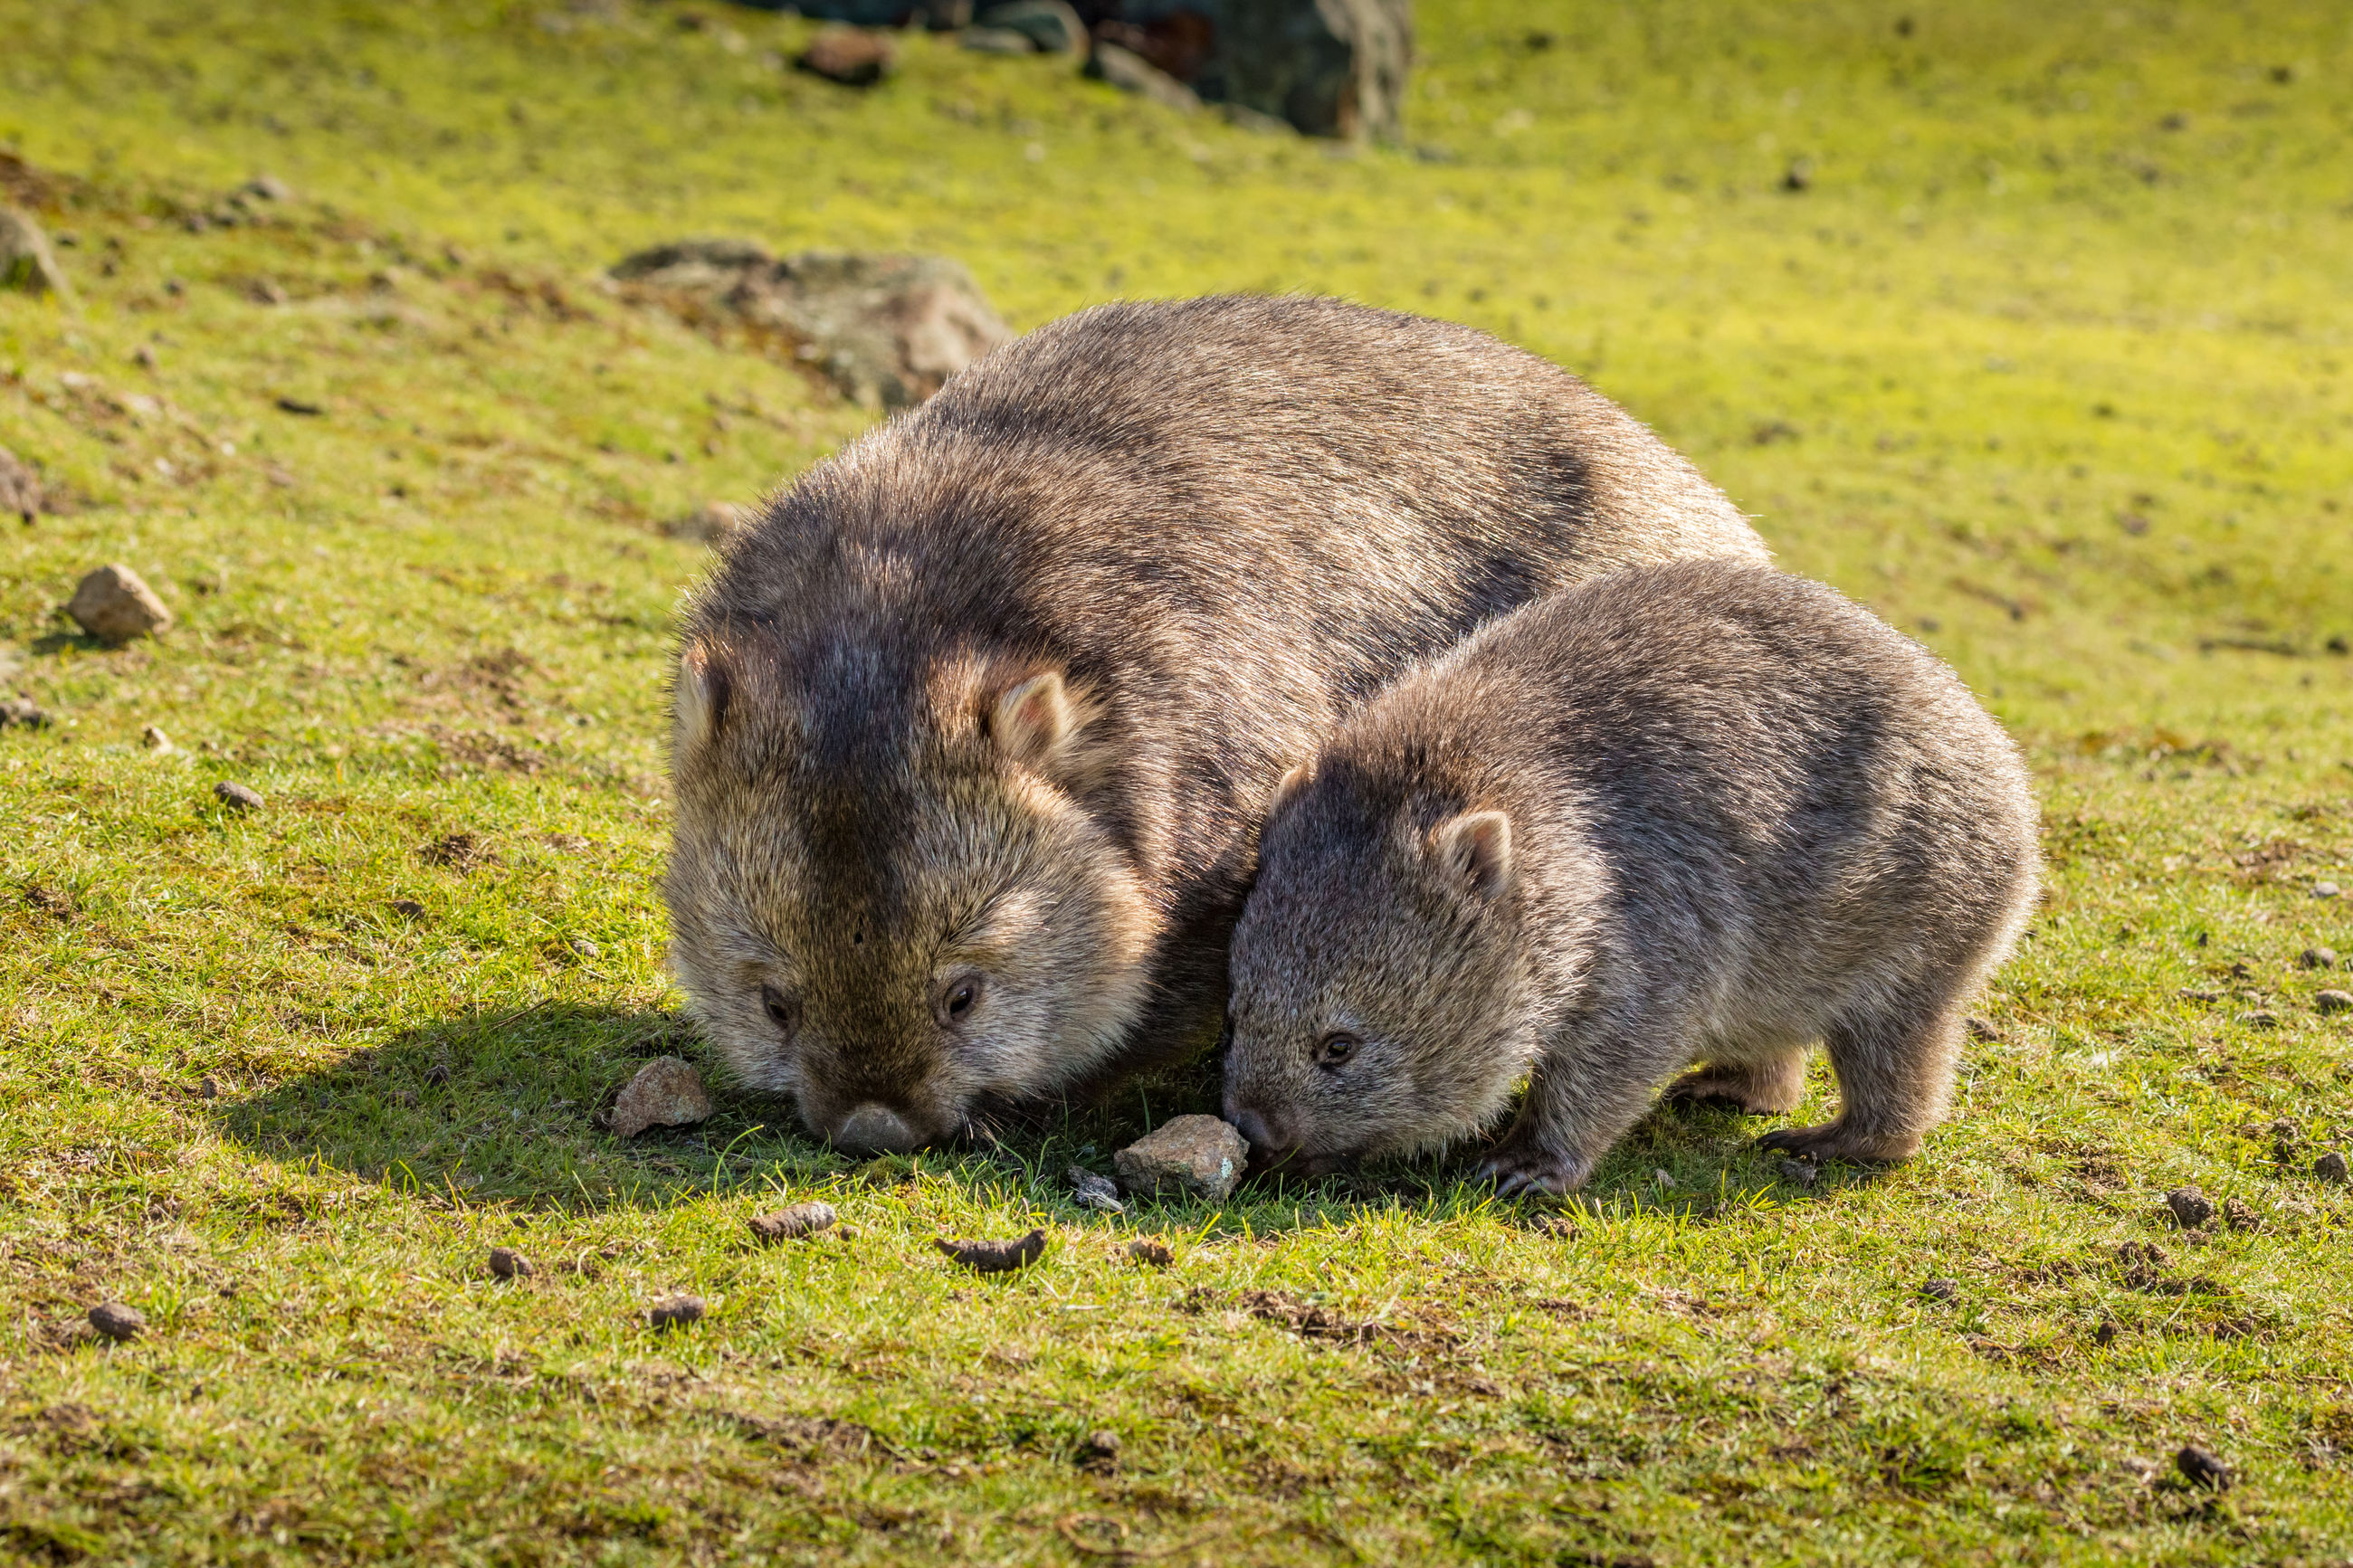 Close-up of marsupials grazing on field